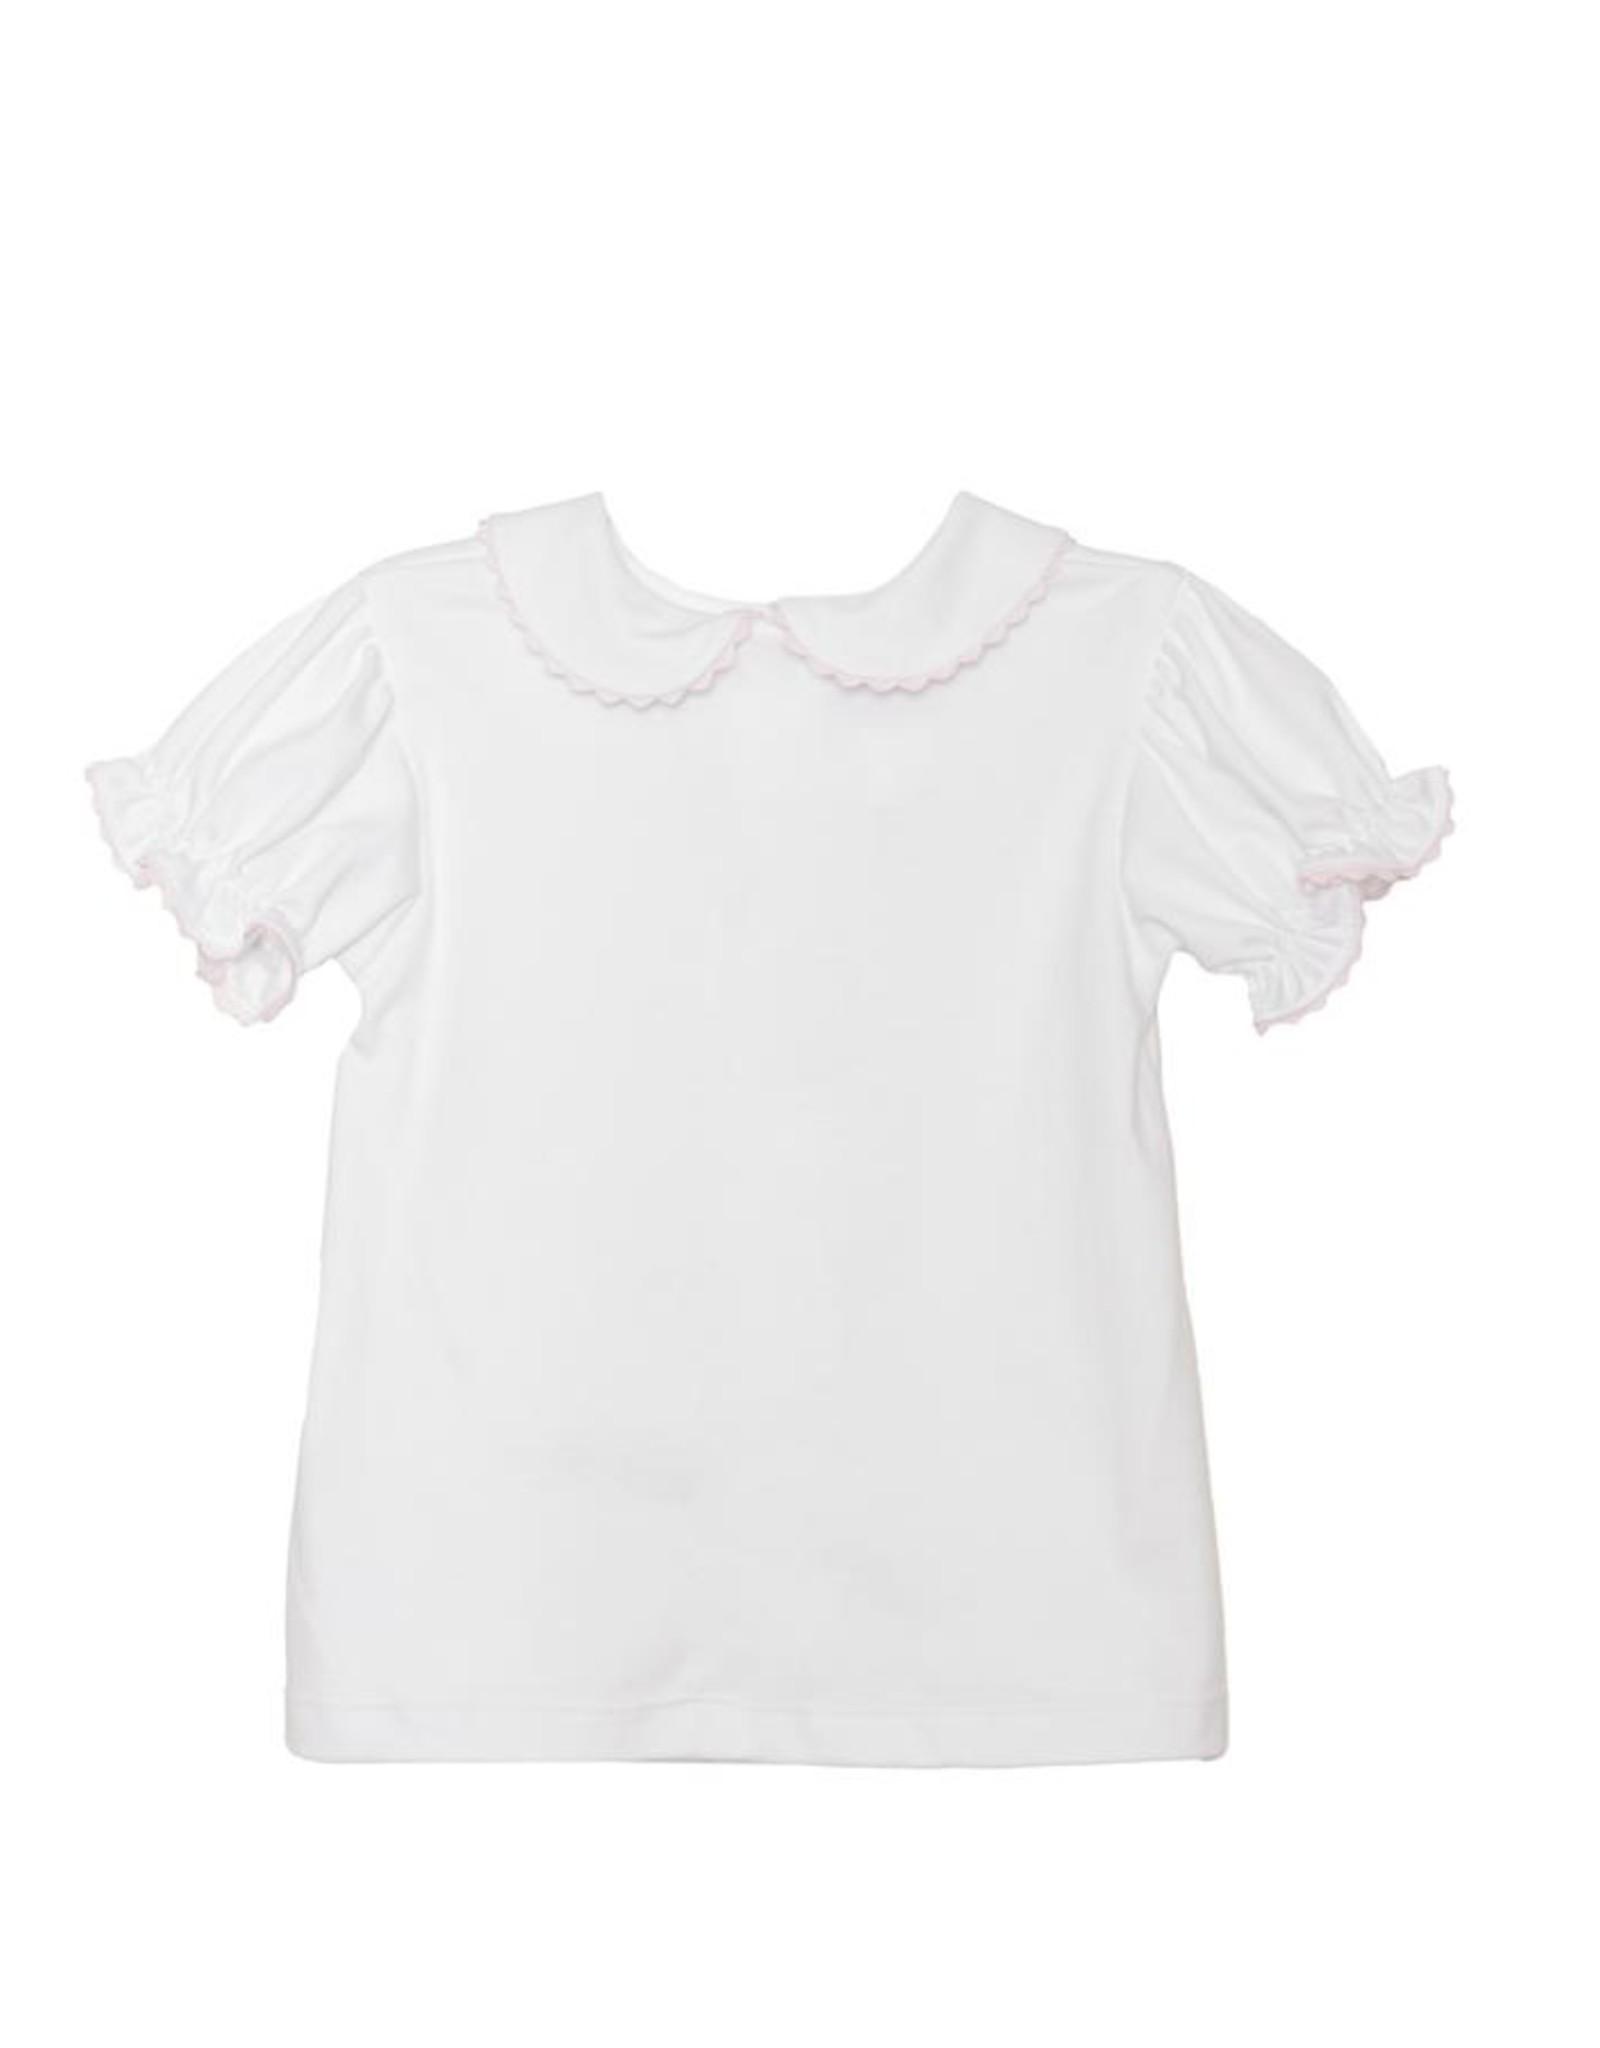 LullabySet Better Together Blouse, White/Pink